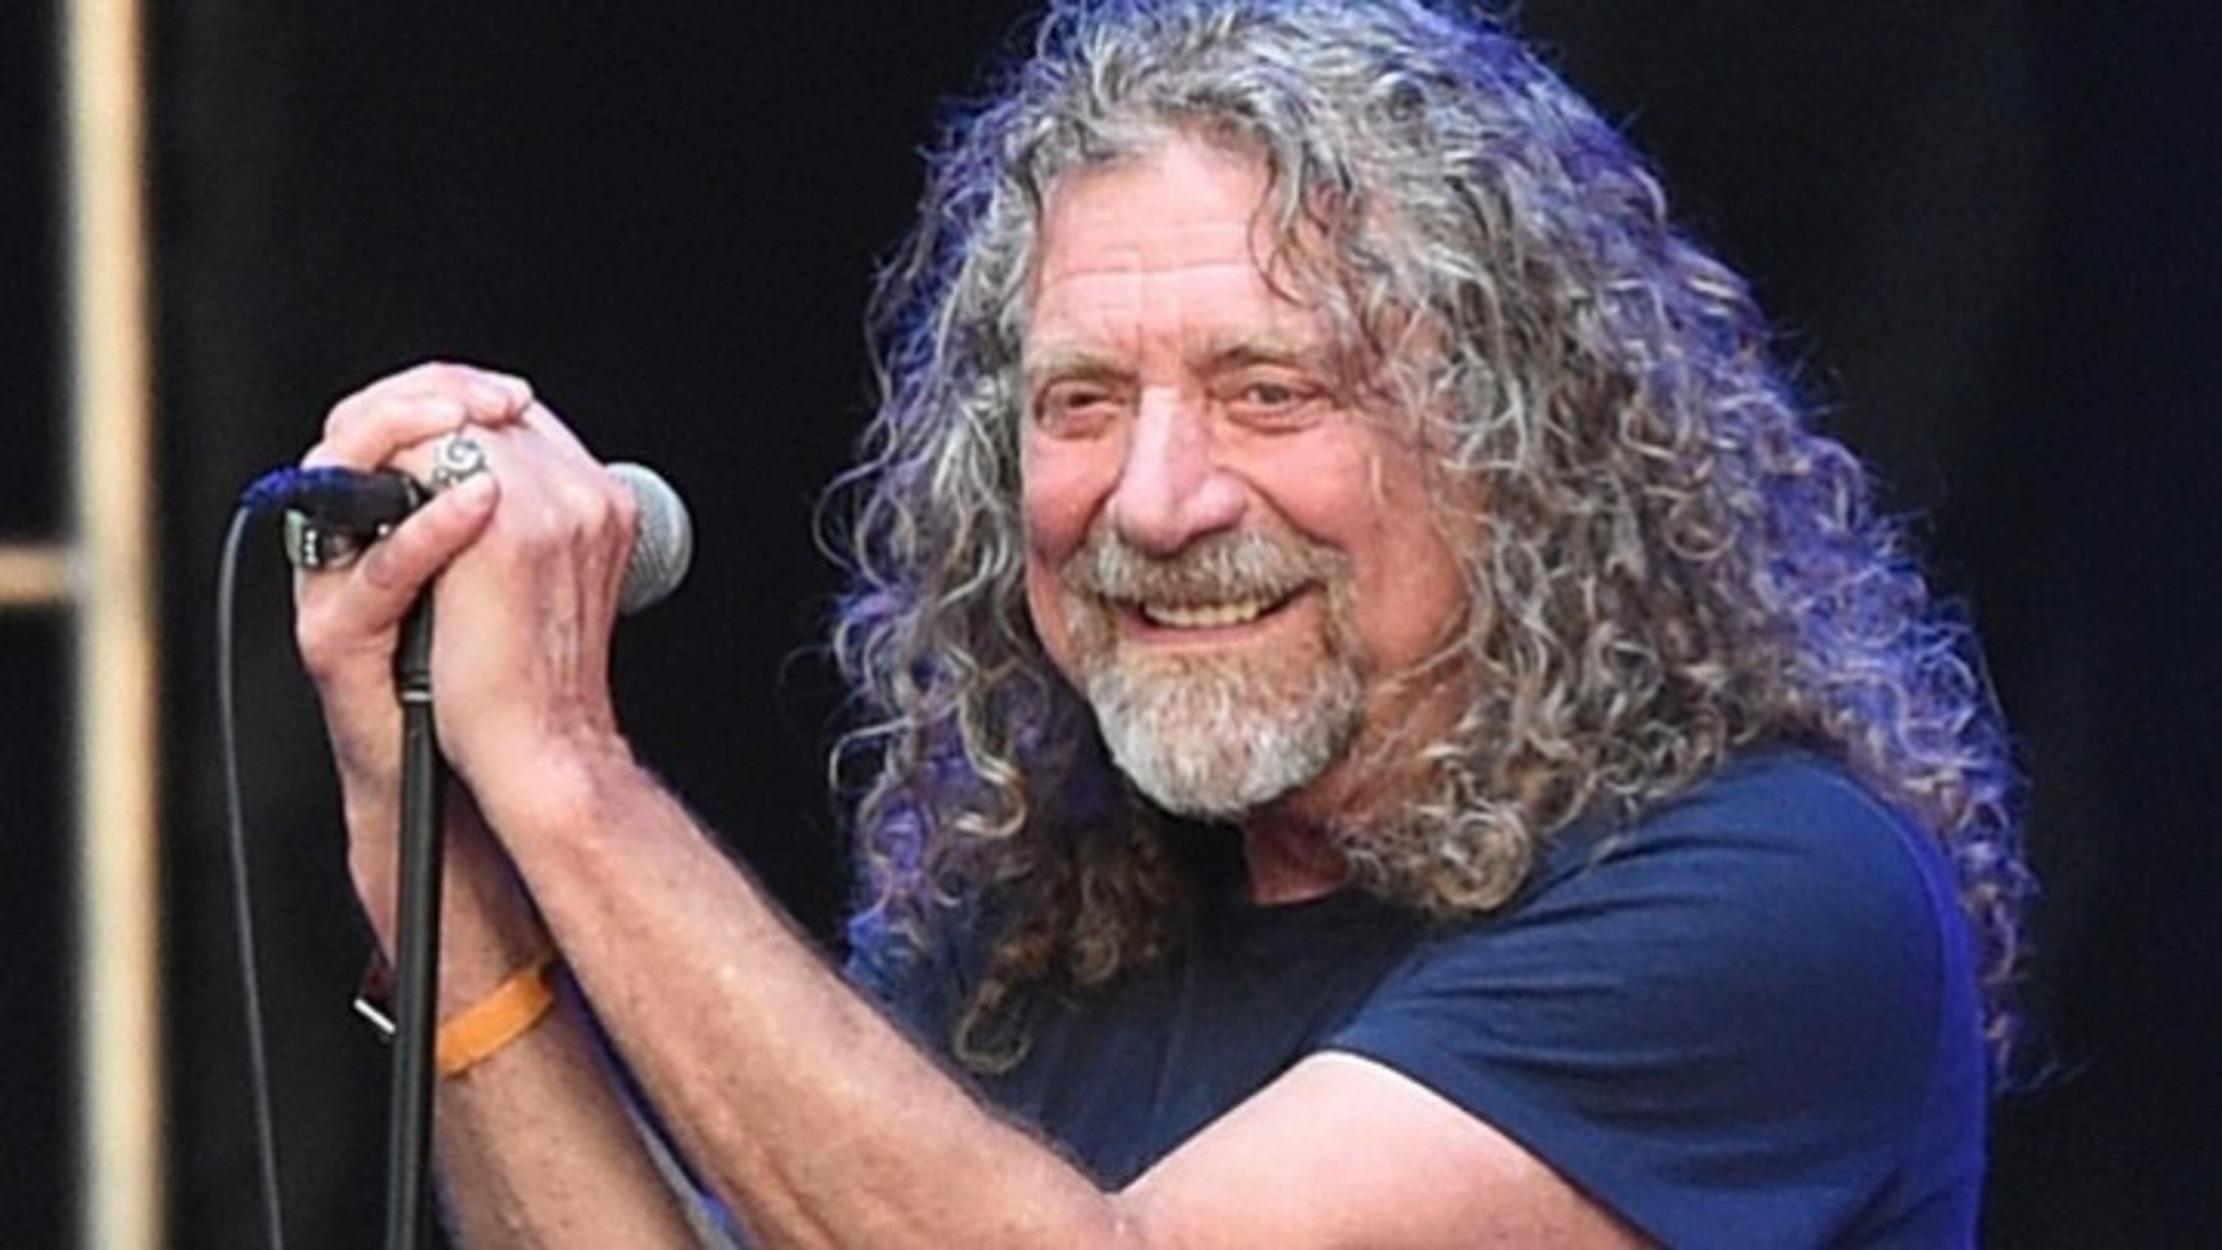 Robert Plant: Ανθολογία τραγουδιών από την καριέρα του (pic, video)